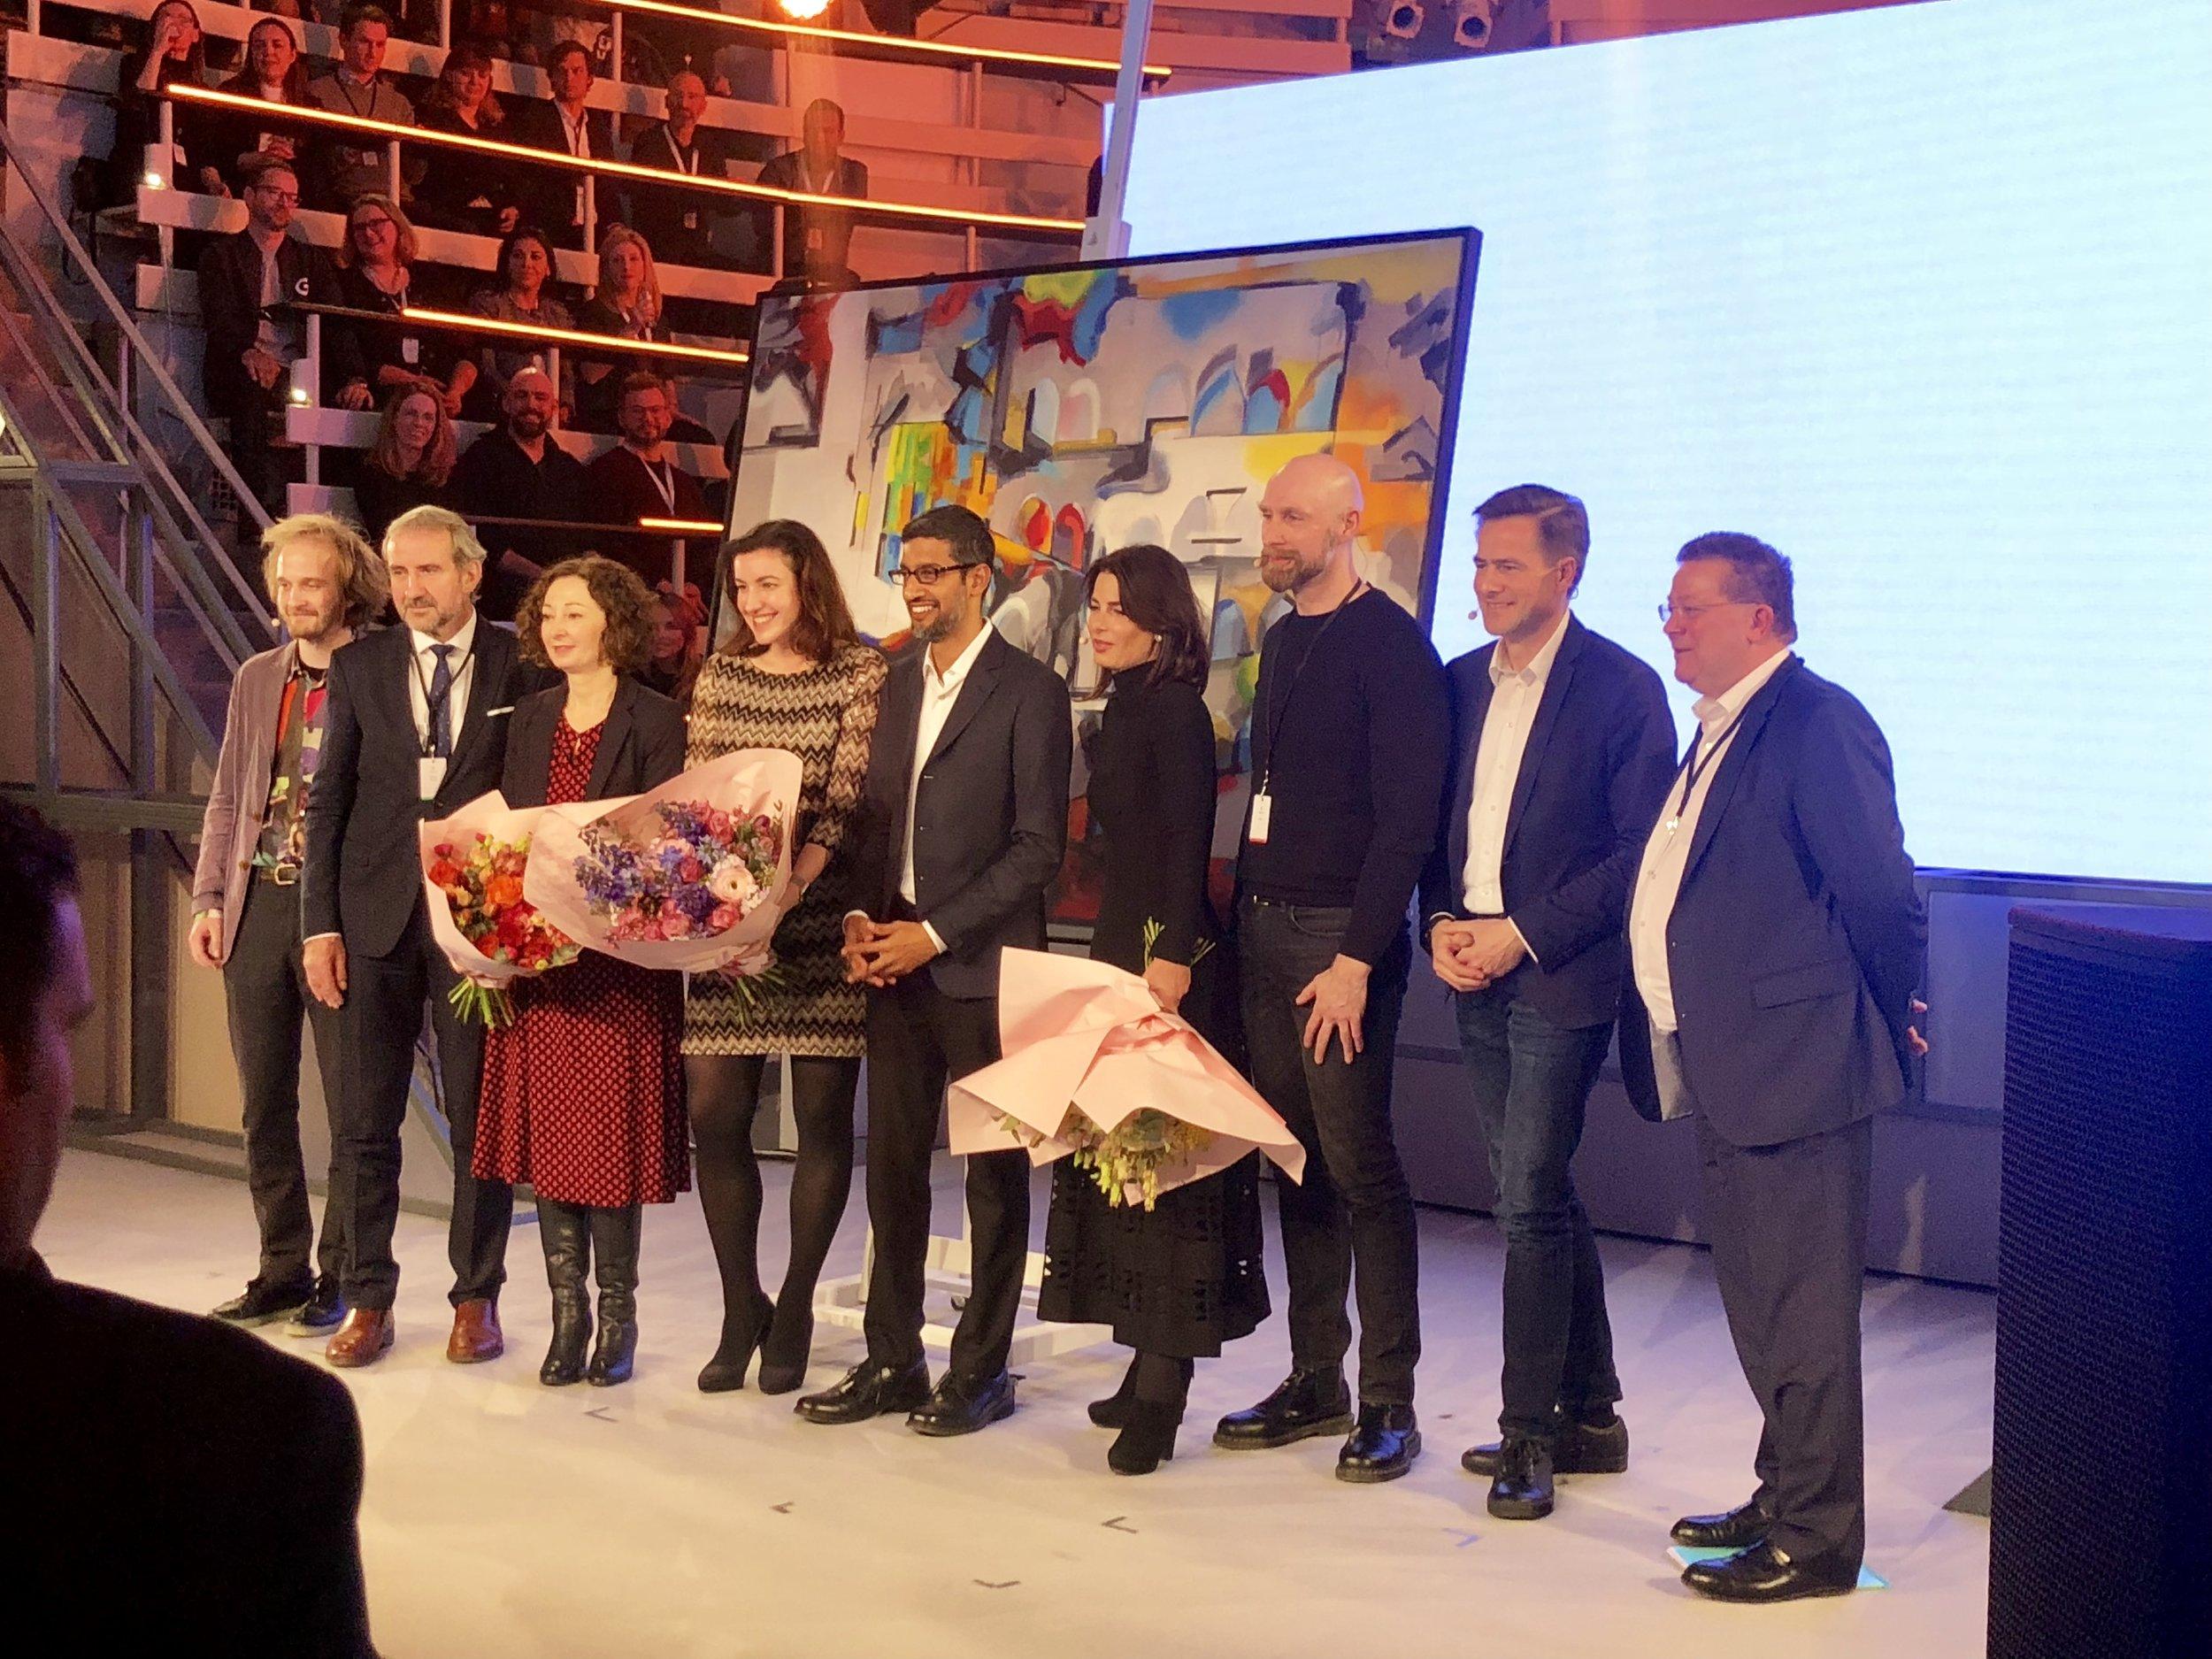 Festive unveiling of the artwork by Roman Lipski @ Google Opening